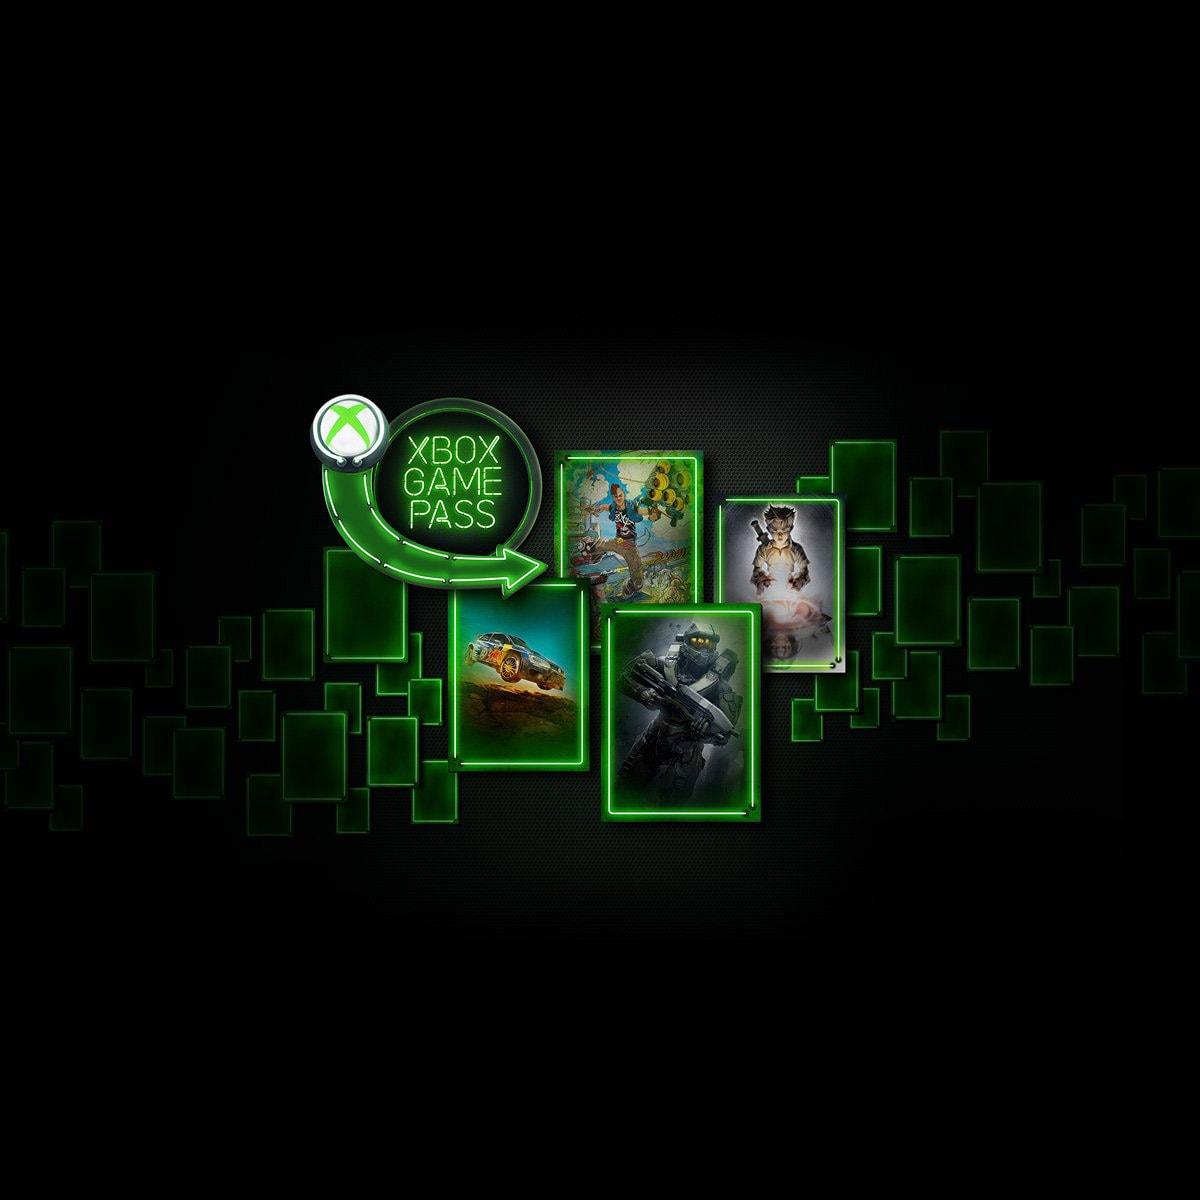 Xbox Game Pass 6 Month Membership